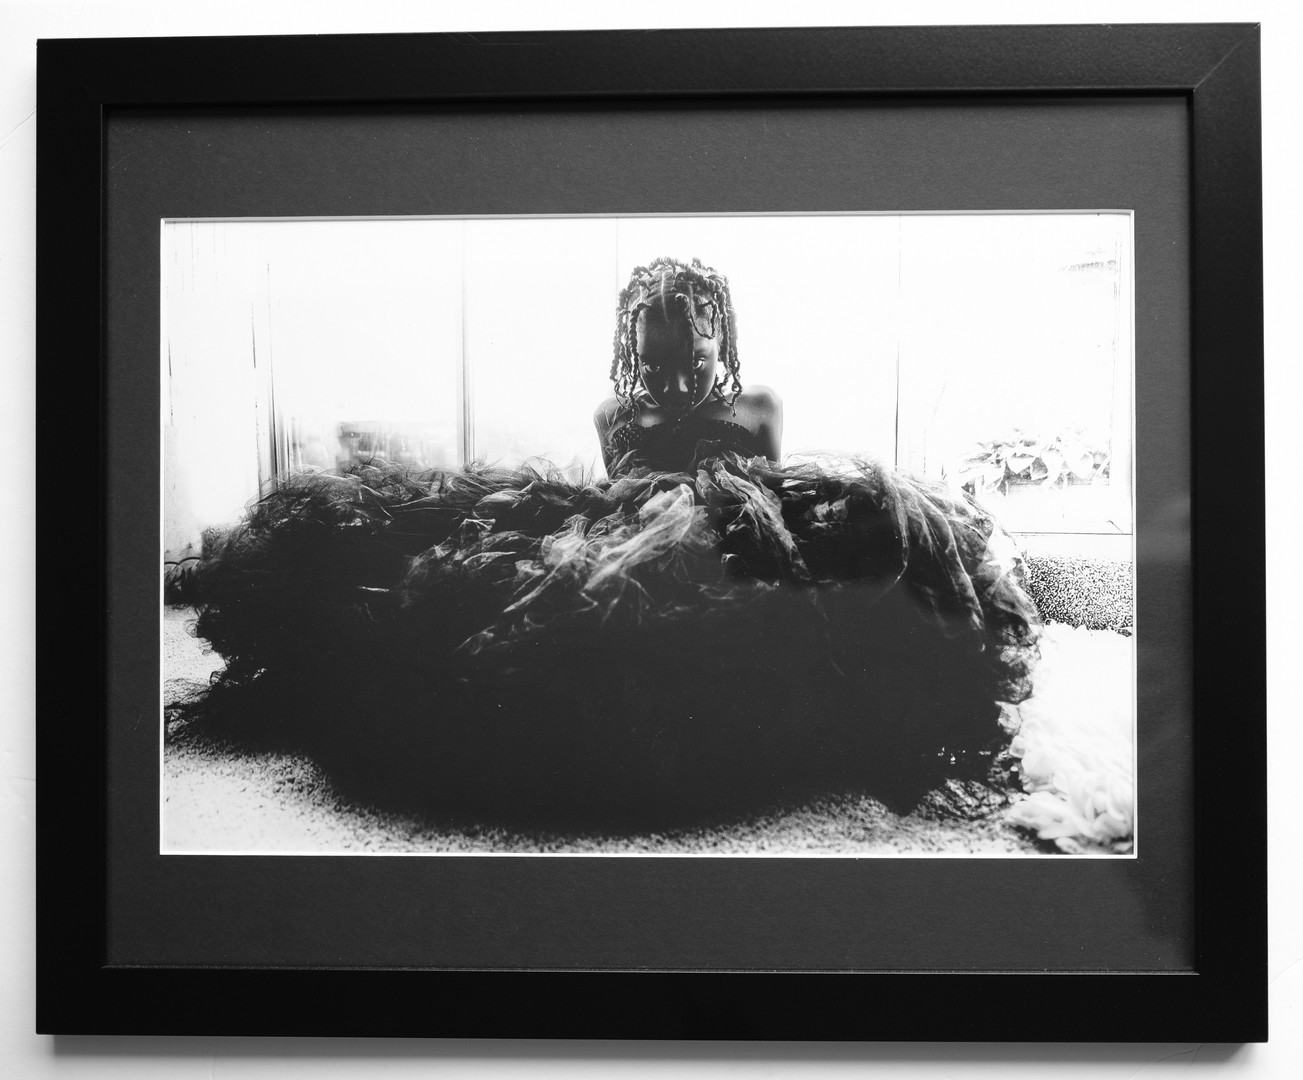 16X20 black frame 12X18 photo 12X18 black mat